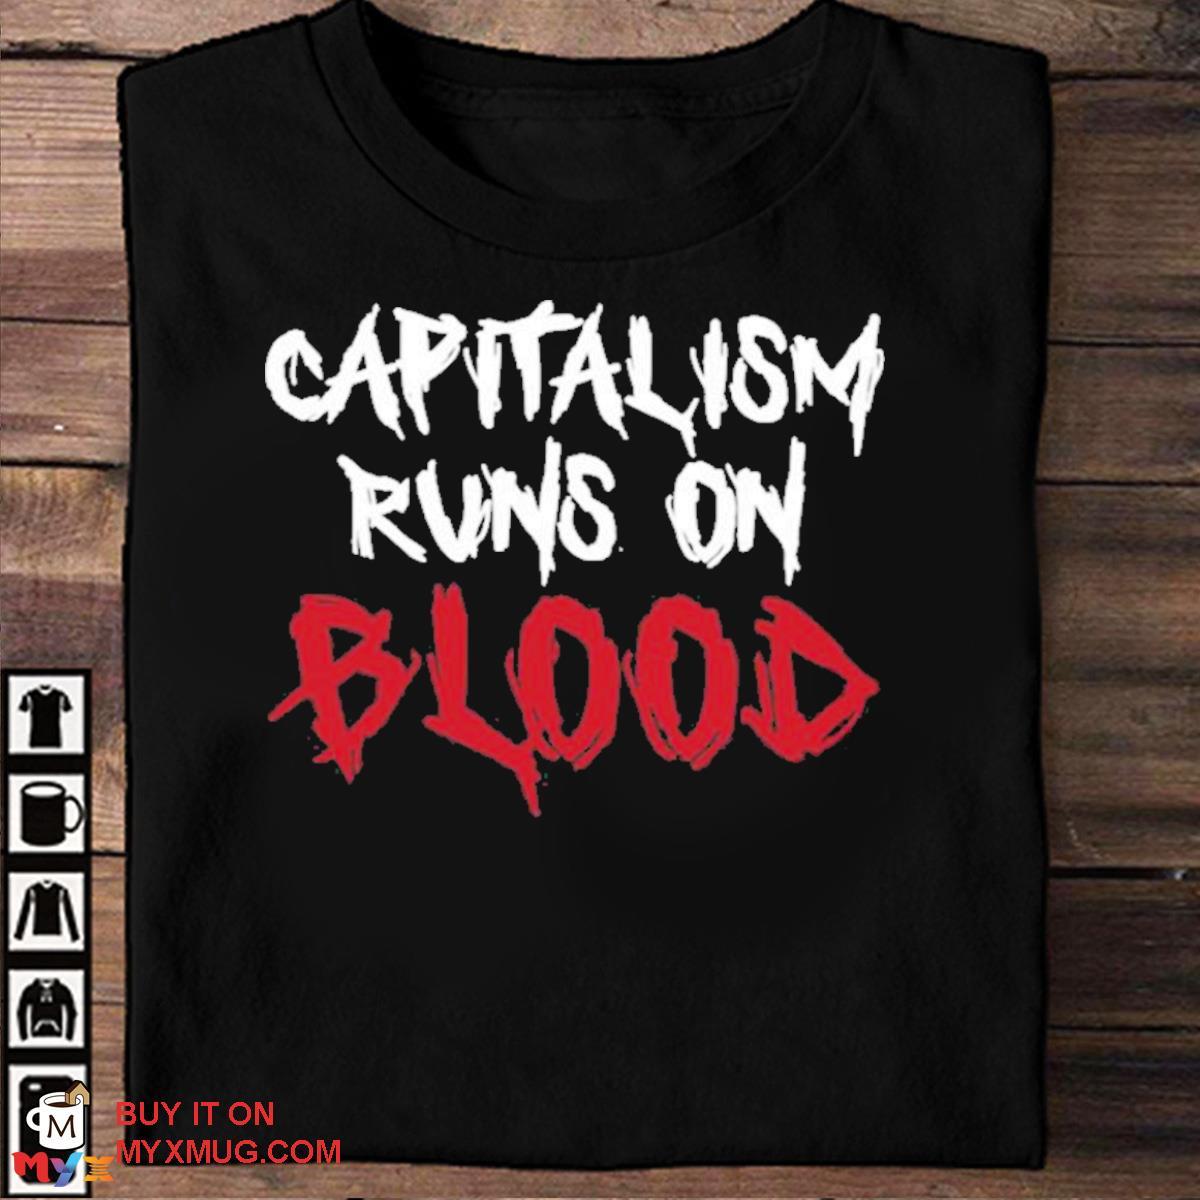 Capitalism runs on blood war is racket left flank vets merch capitalism runs on blood shirt